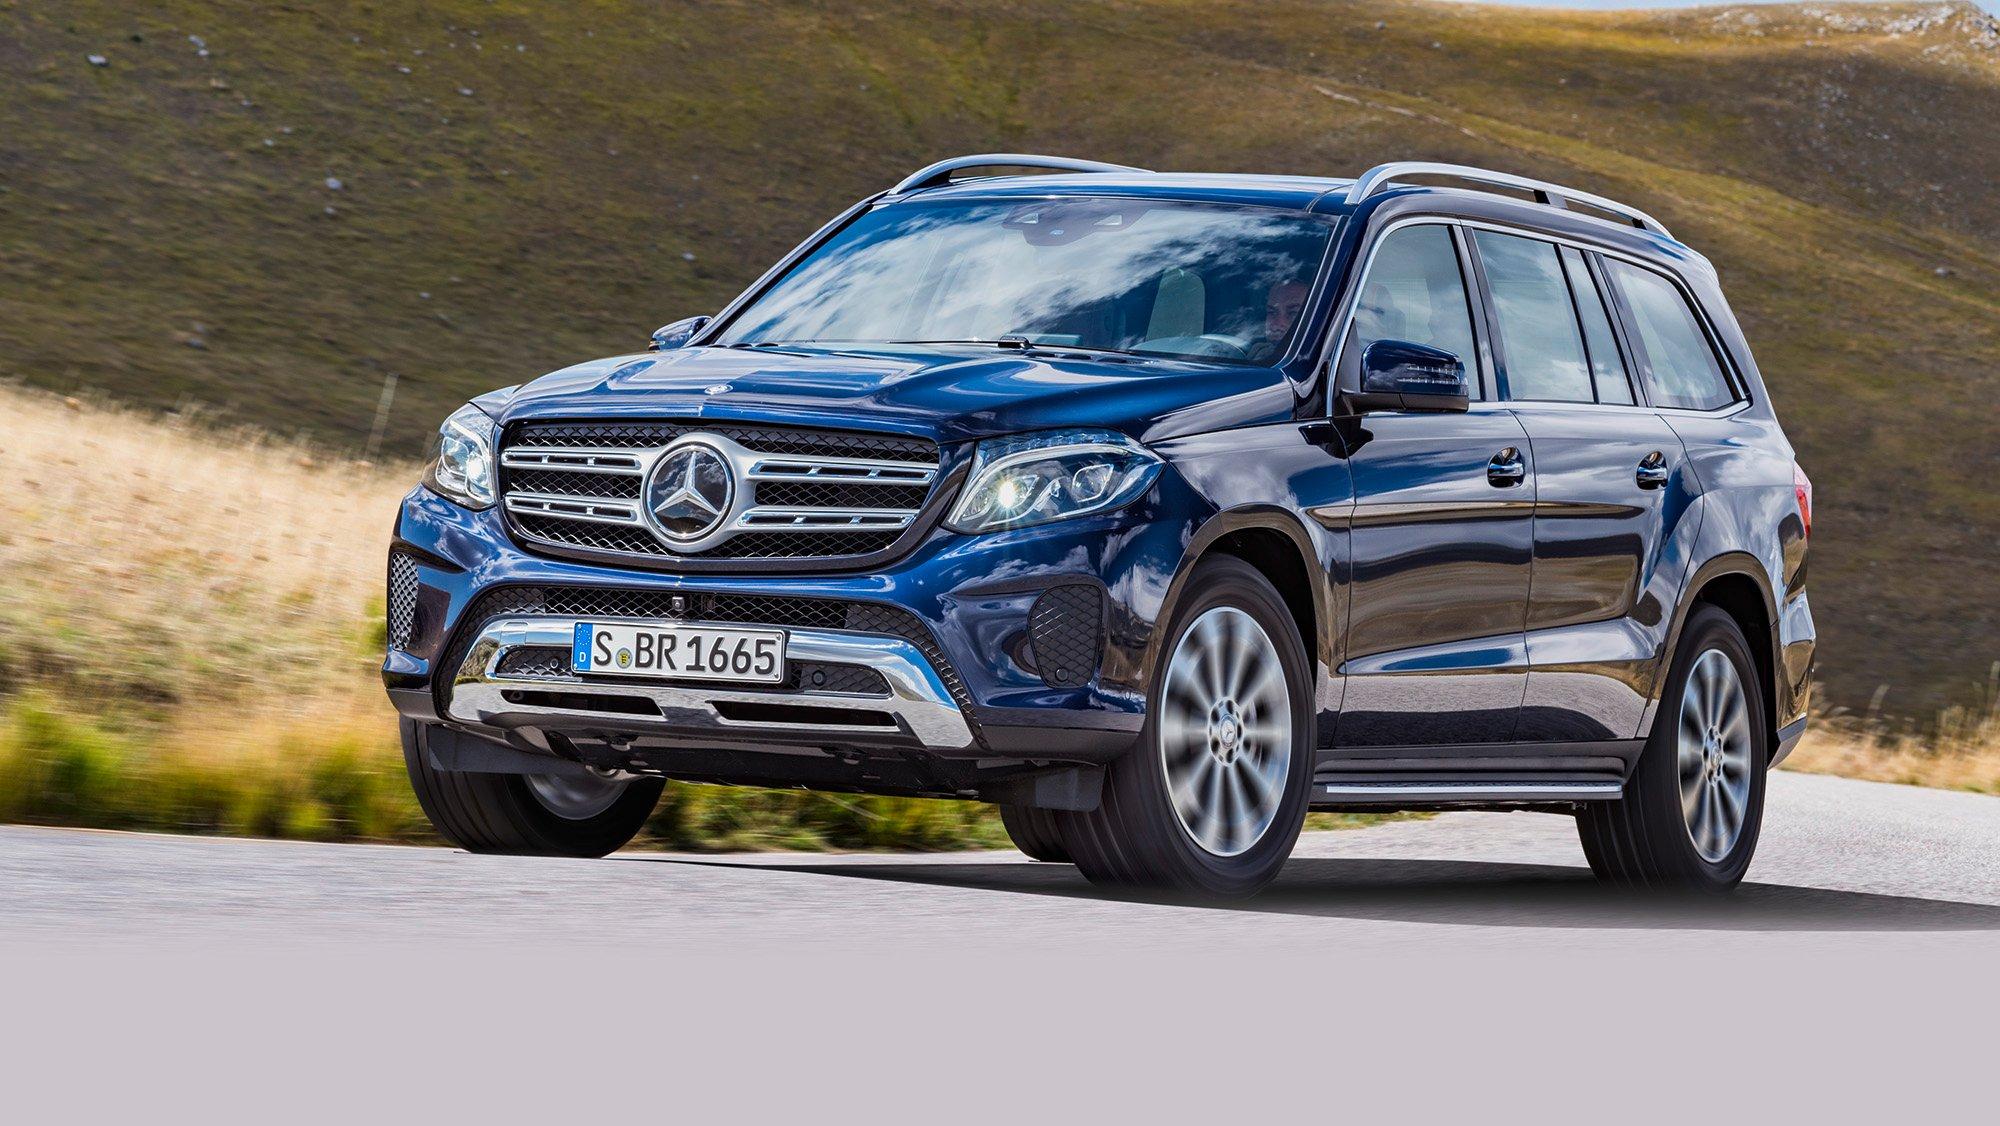 Image result for Mercedes-Benz GLS-Class 2016